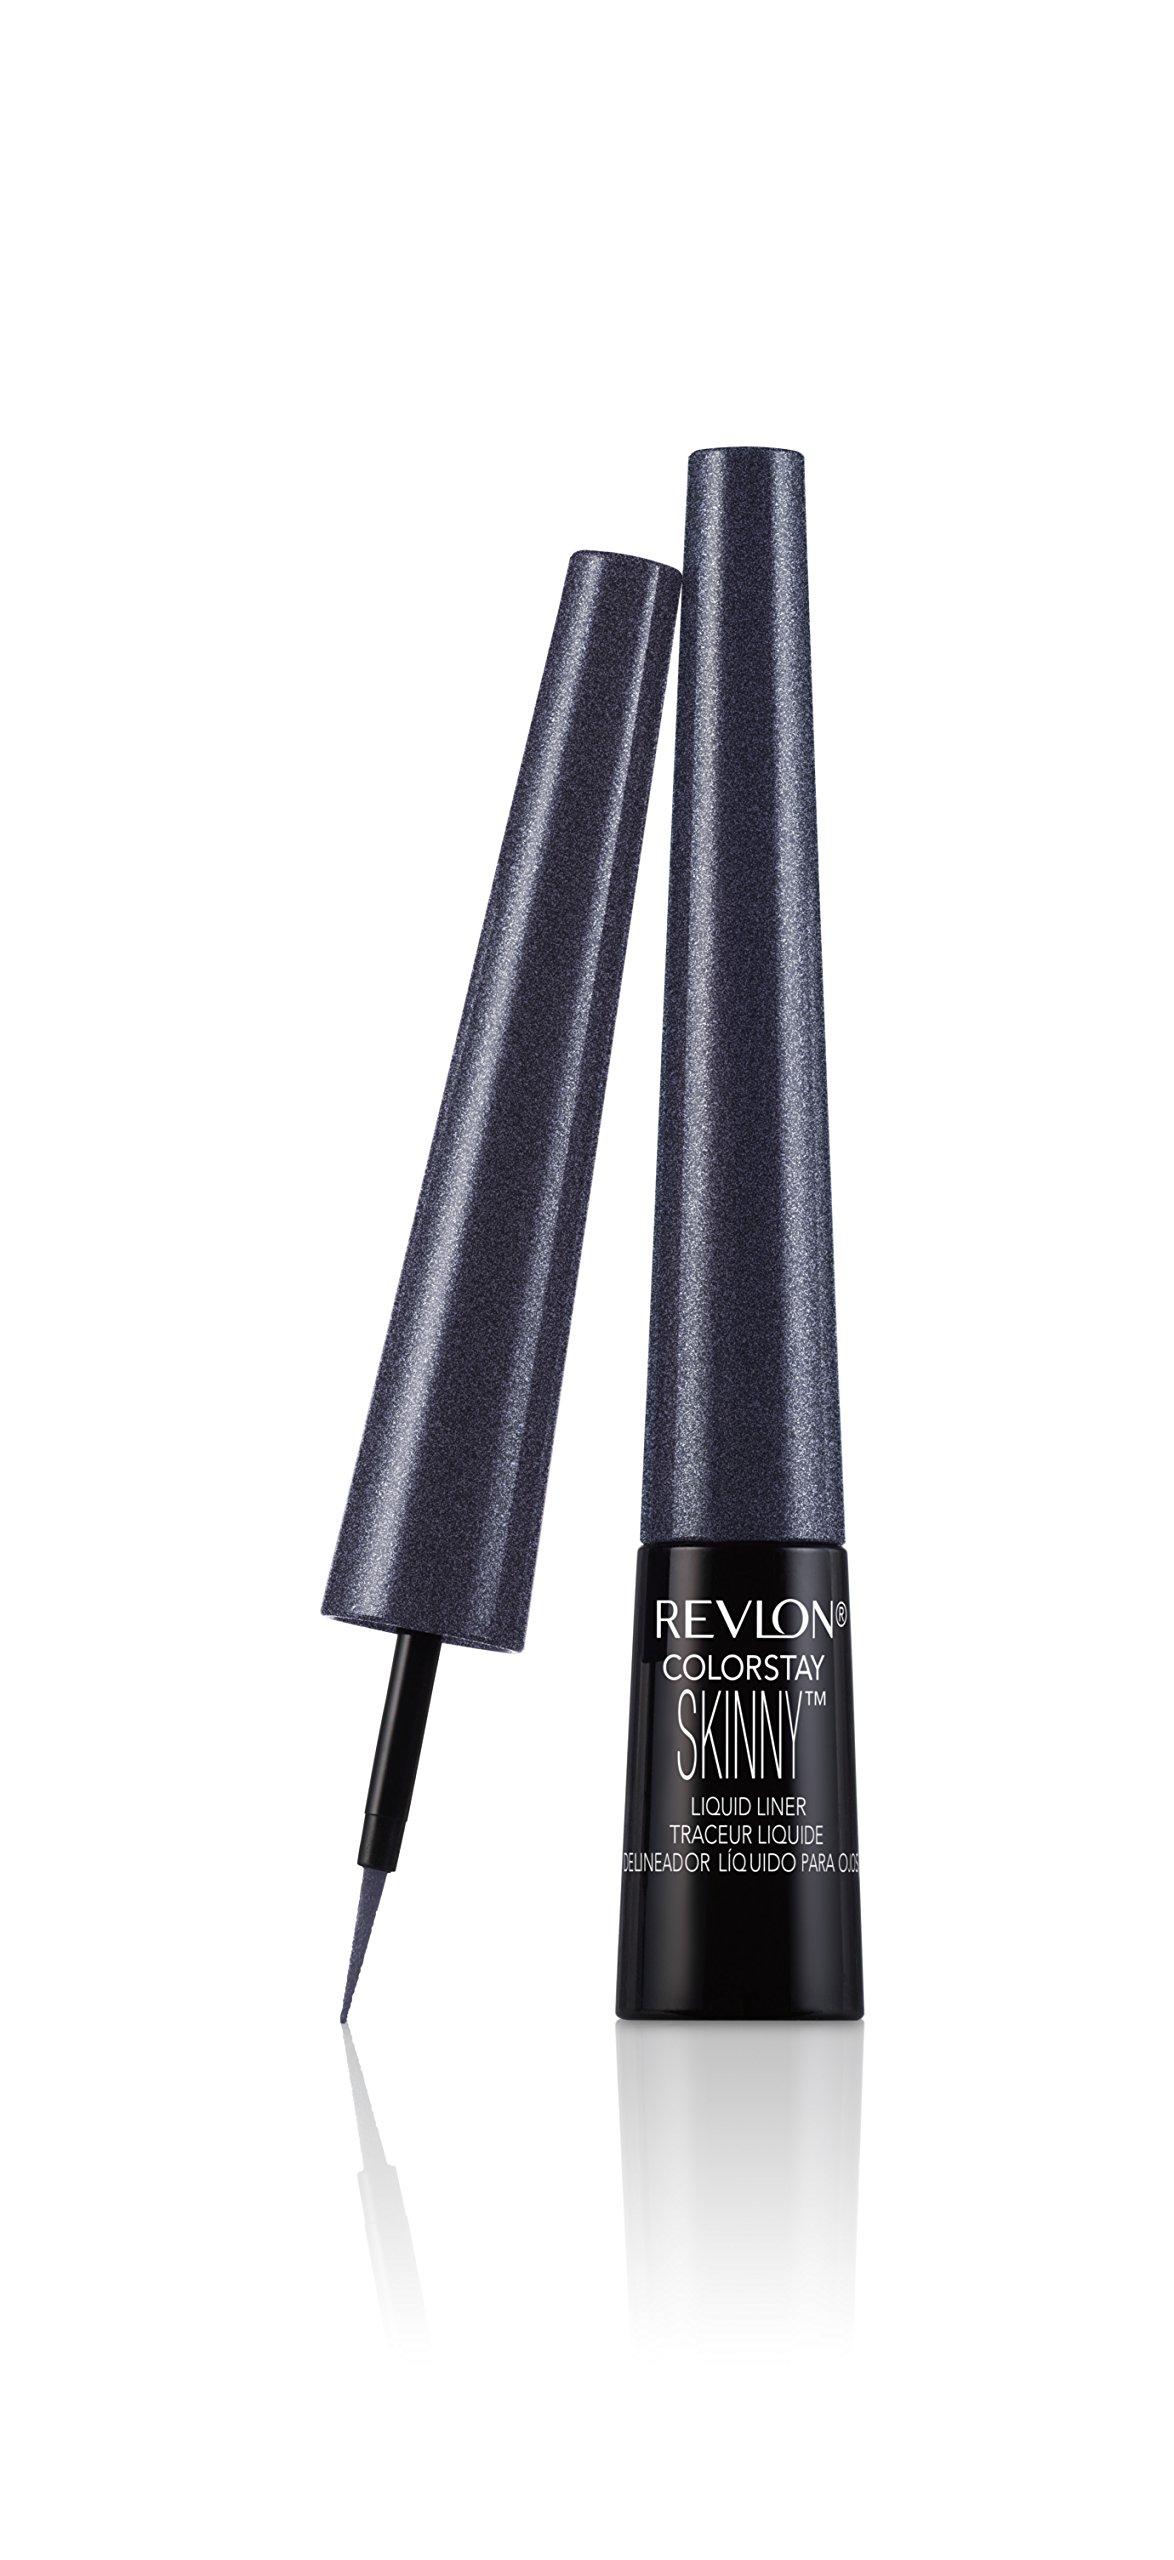 Revlon Colorstay Skinny Liquid Liner, 0.08 Fl Oz